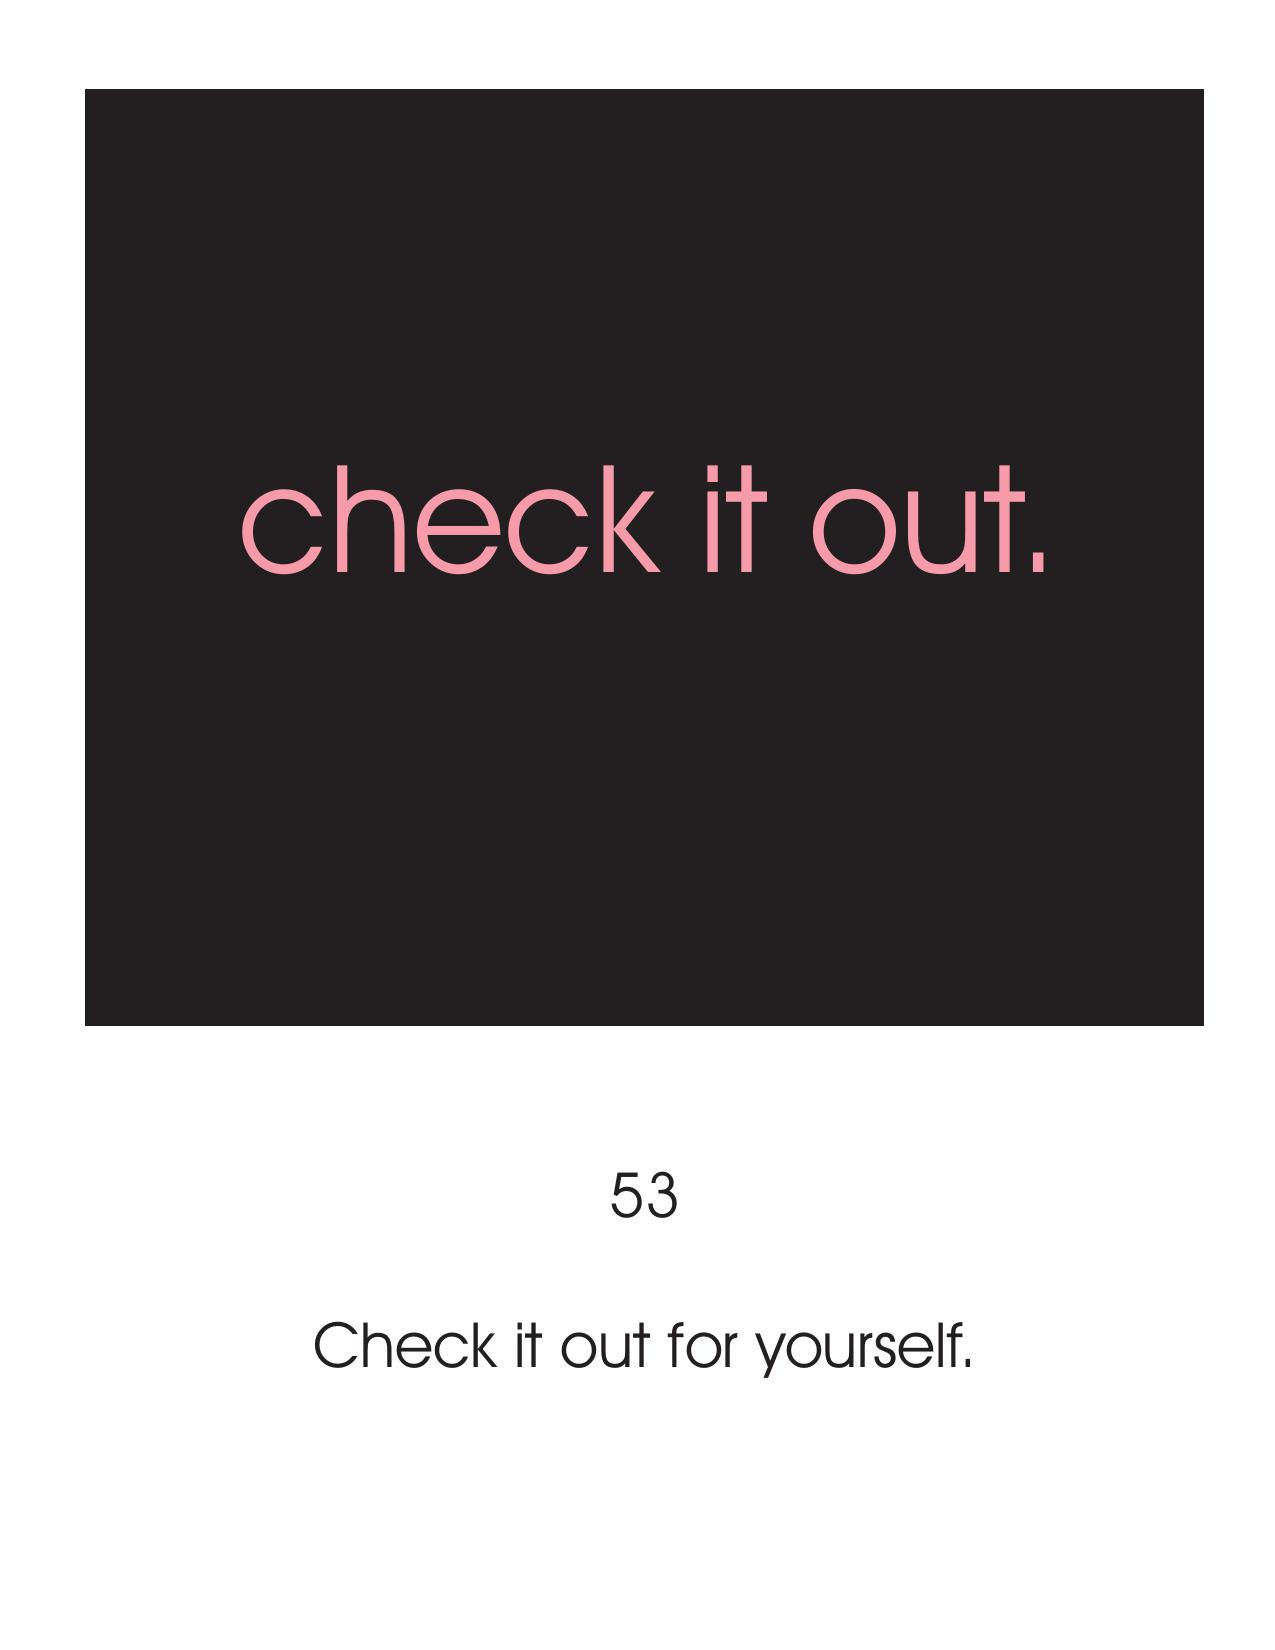 POM Website 053.jpg